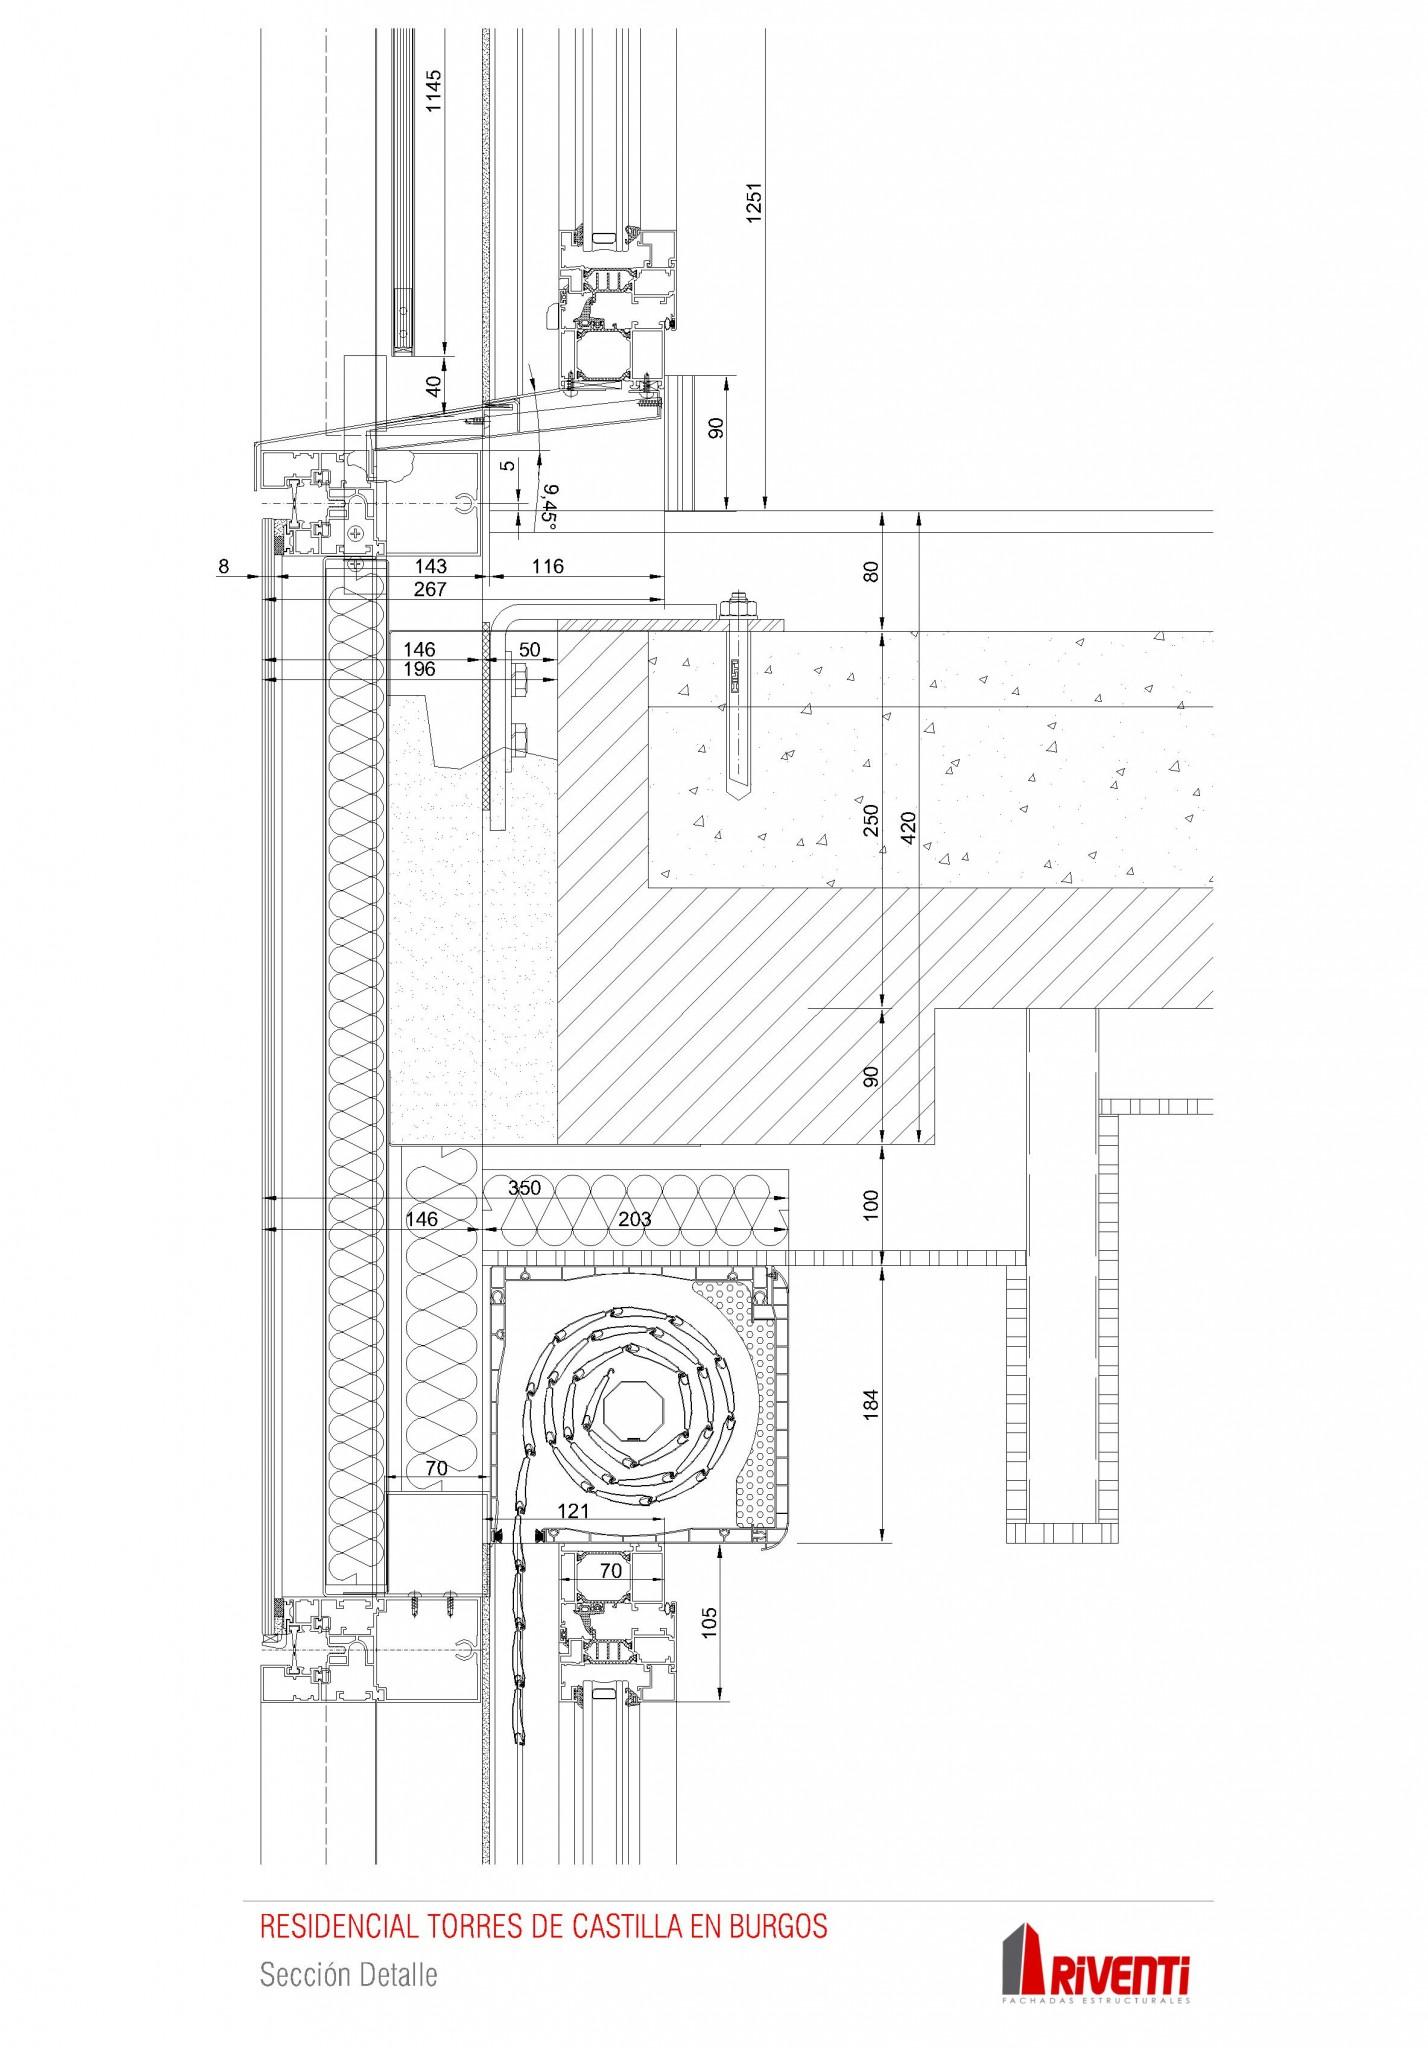 FACHADA-TORRES DE CASTILLA-DETALLES CONSTRUCTIVOS-RIVENTI (1)